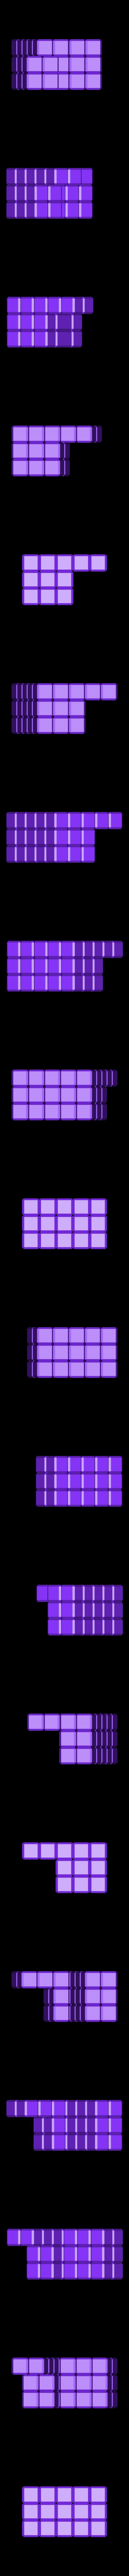 40_units.stl Download free STL file Cube Puzzle: 5 x 5 x 5, Five-Piece Dissection • 3D print model, LGBU